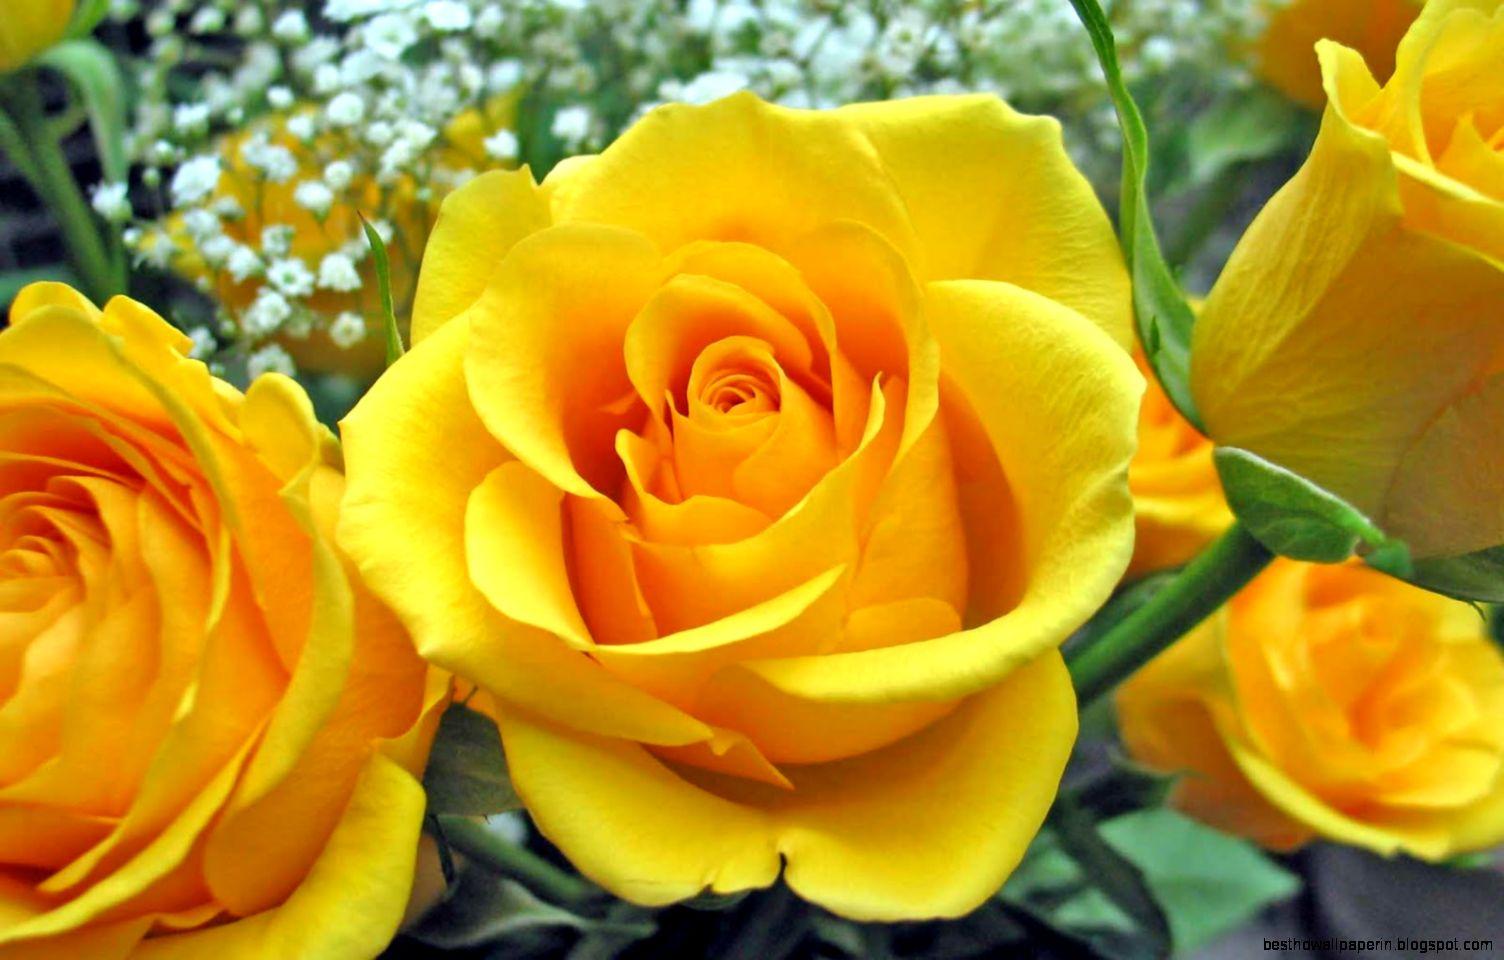 Yellow Flower Wallpaper Free Download For Desktop Best Hd Wallpapers